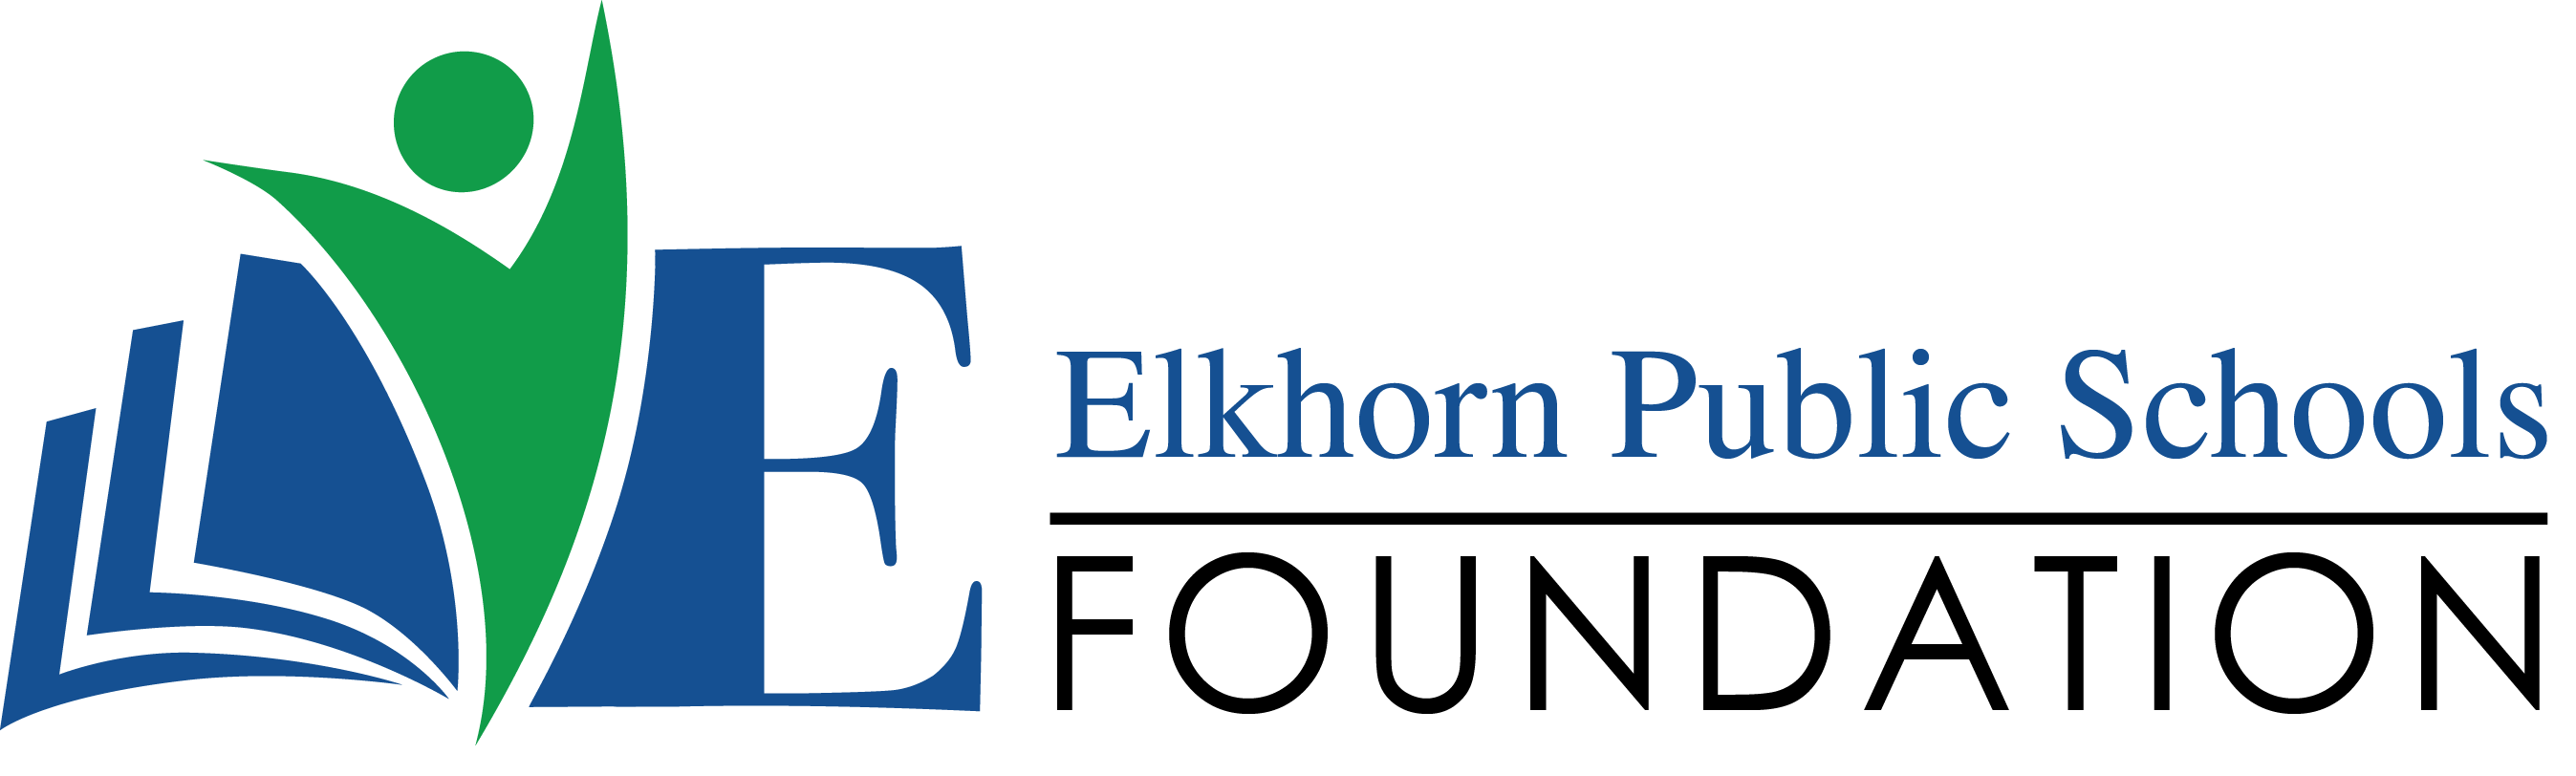 Elkhorn Public Schools Foundation